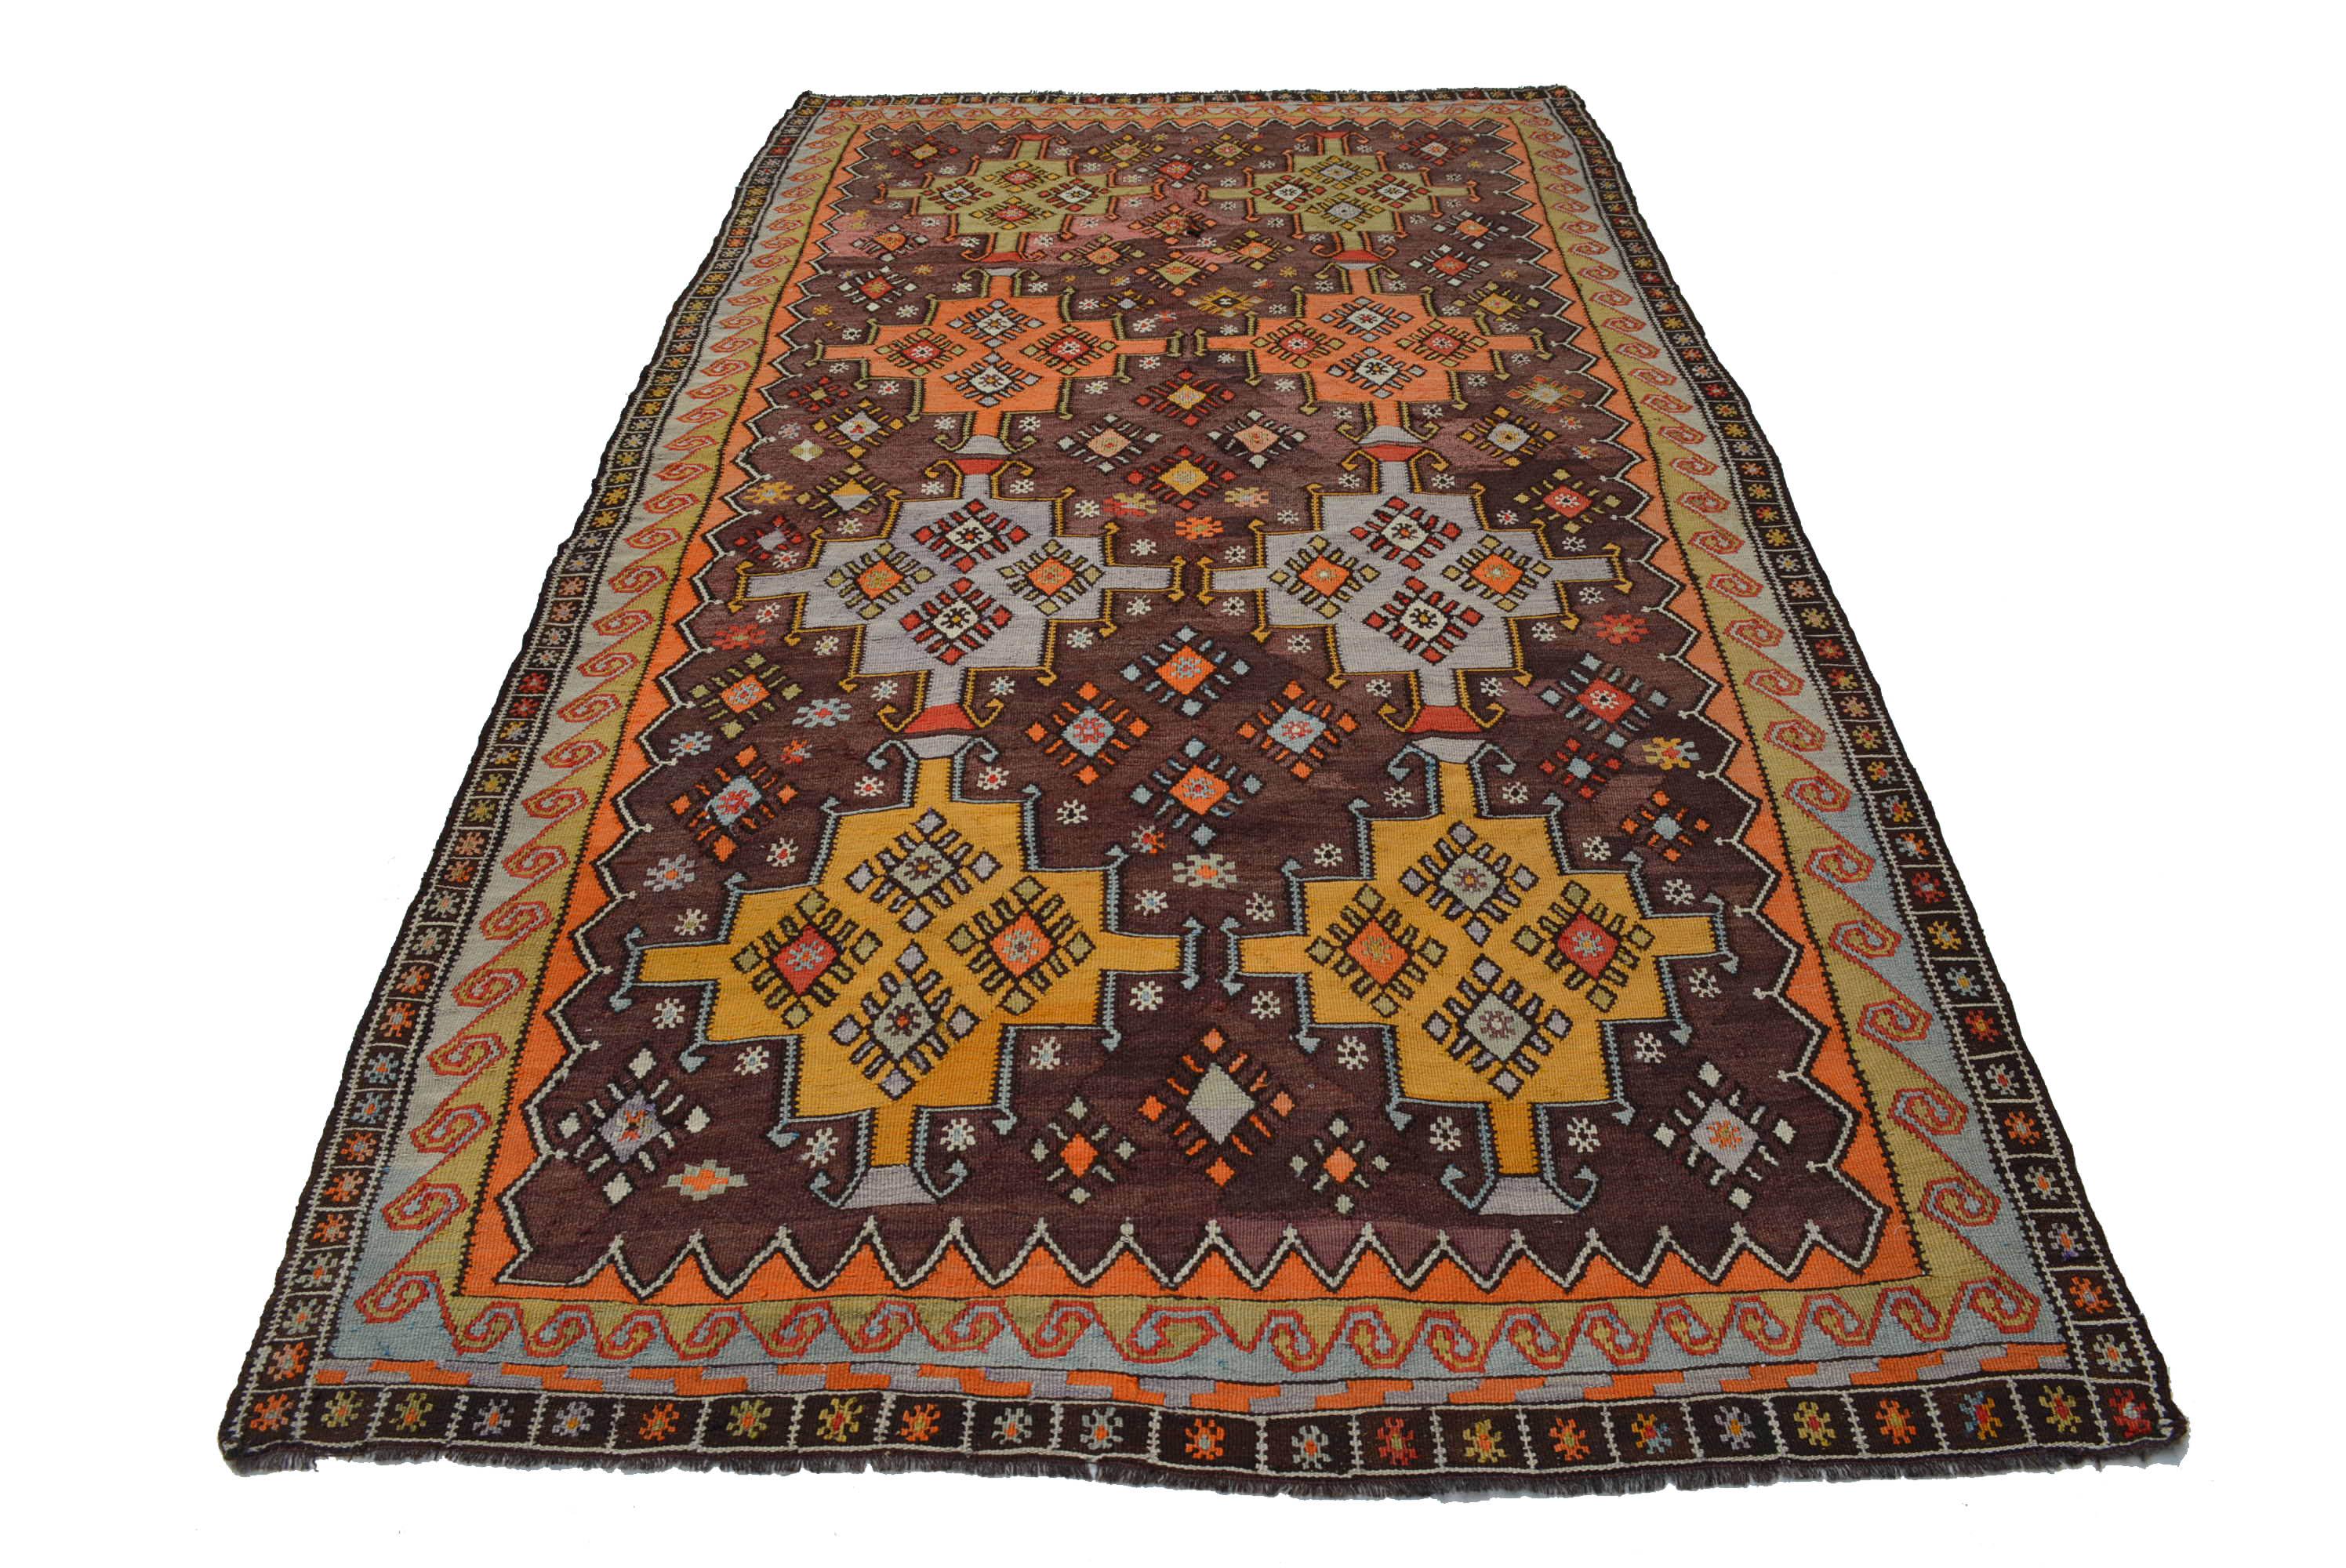 antik anatolischer kelim teppich wolle gewebt 315x170cm kilim rug tappeto tapis ebay. Black Bedroom Furniture Sets. Home Design Ideas